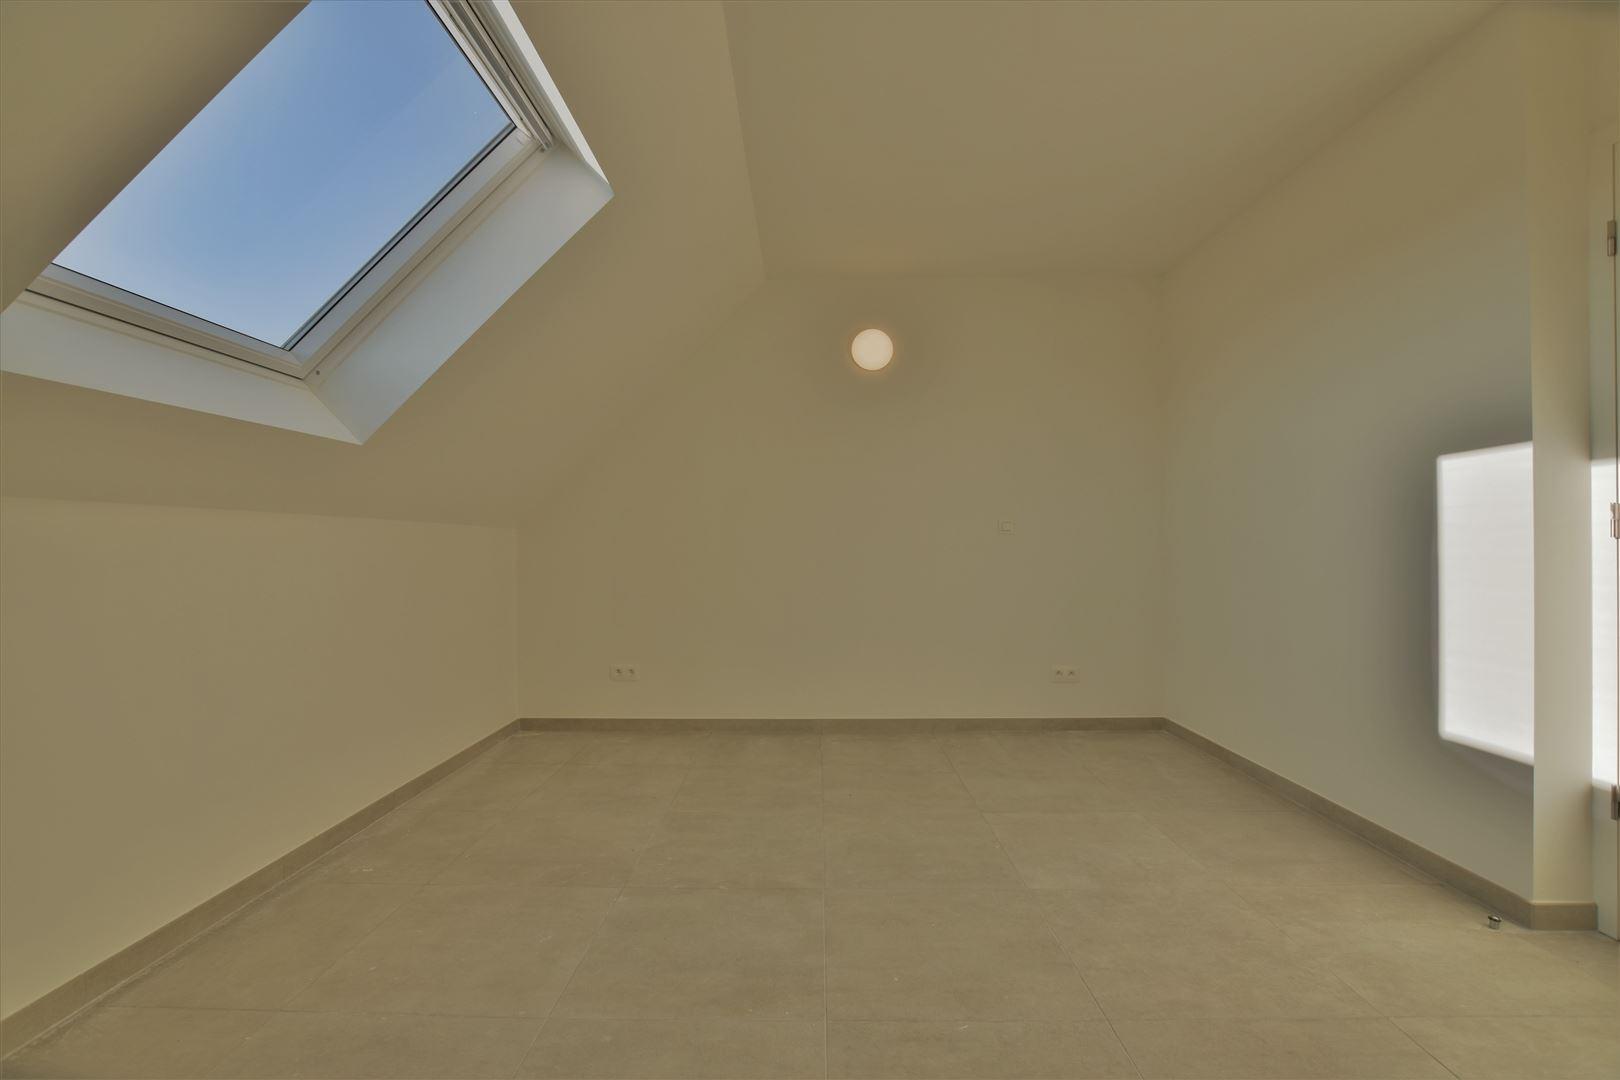 Foto 12 : Duplex/Penthouse te 9200 APPELS (België) - Prijs € 800